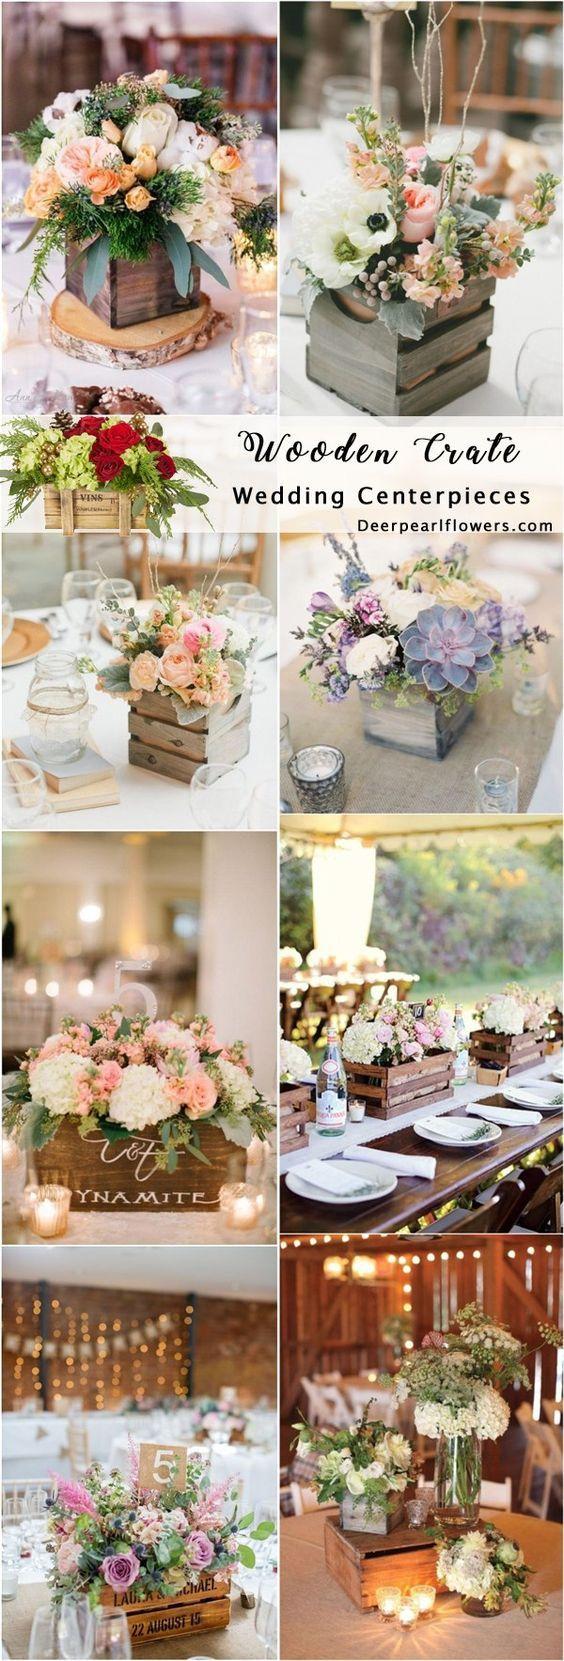 Rustic country wooden crate wedding centerpieces #rusticweddings #countryweddings / http://www.deerpearlflowers.com/rustic-woodsy-wedding-trend-2018-wooden-crates/